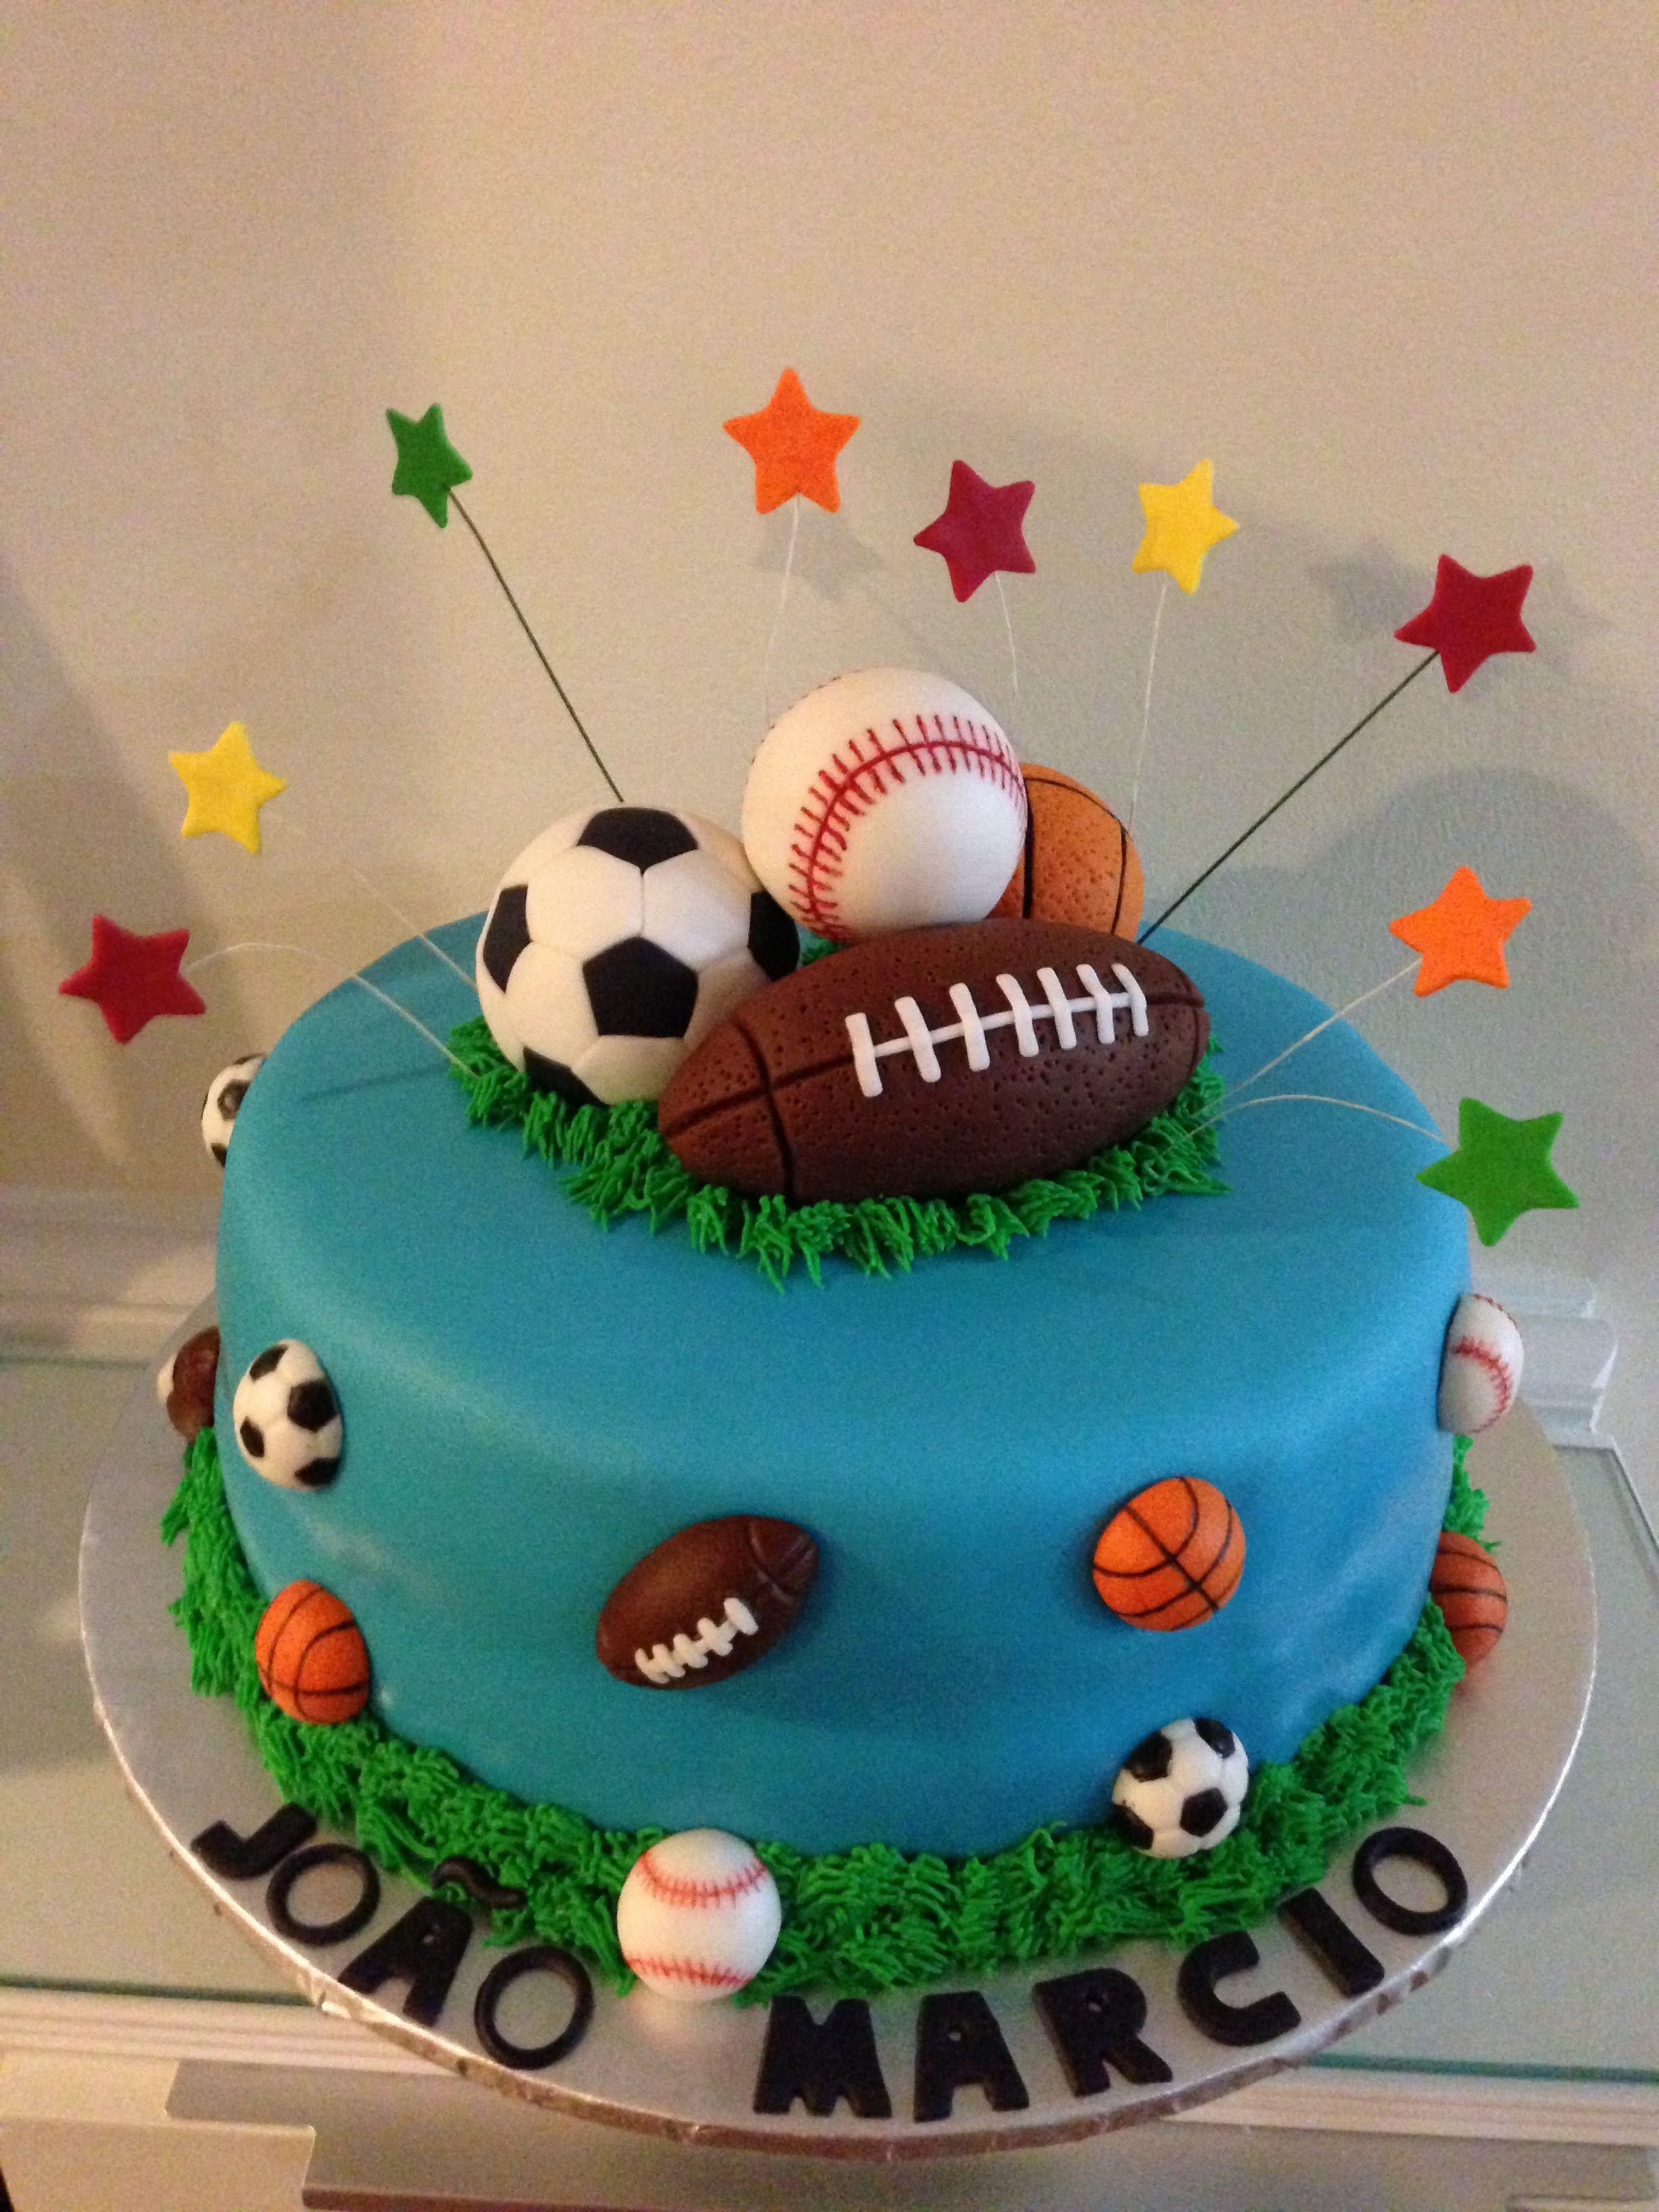 Pin By Fadila Sari On Golf Sports Birthday Cakes Birthday Cake Pictures Sports Themed Cakes